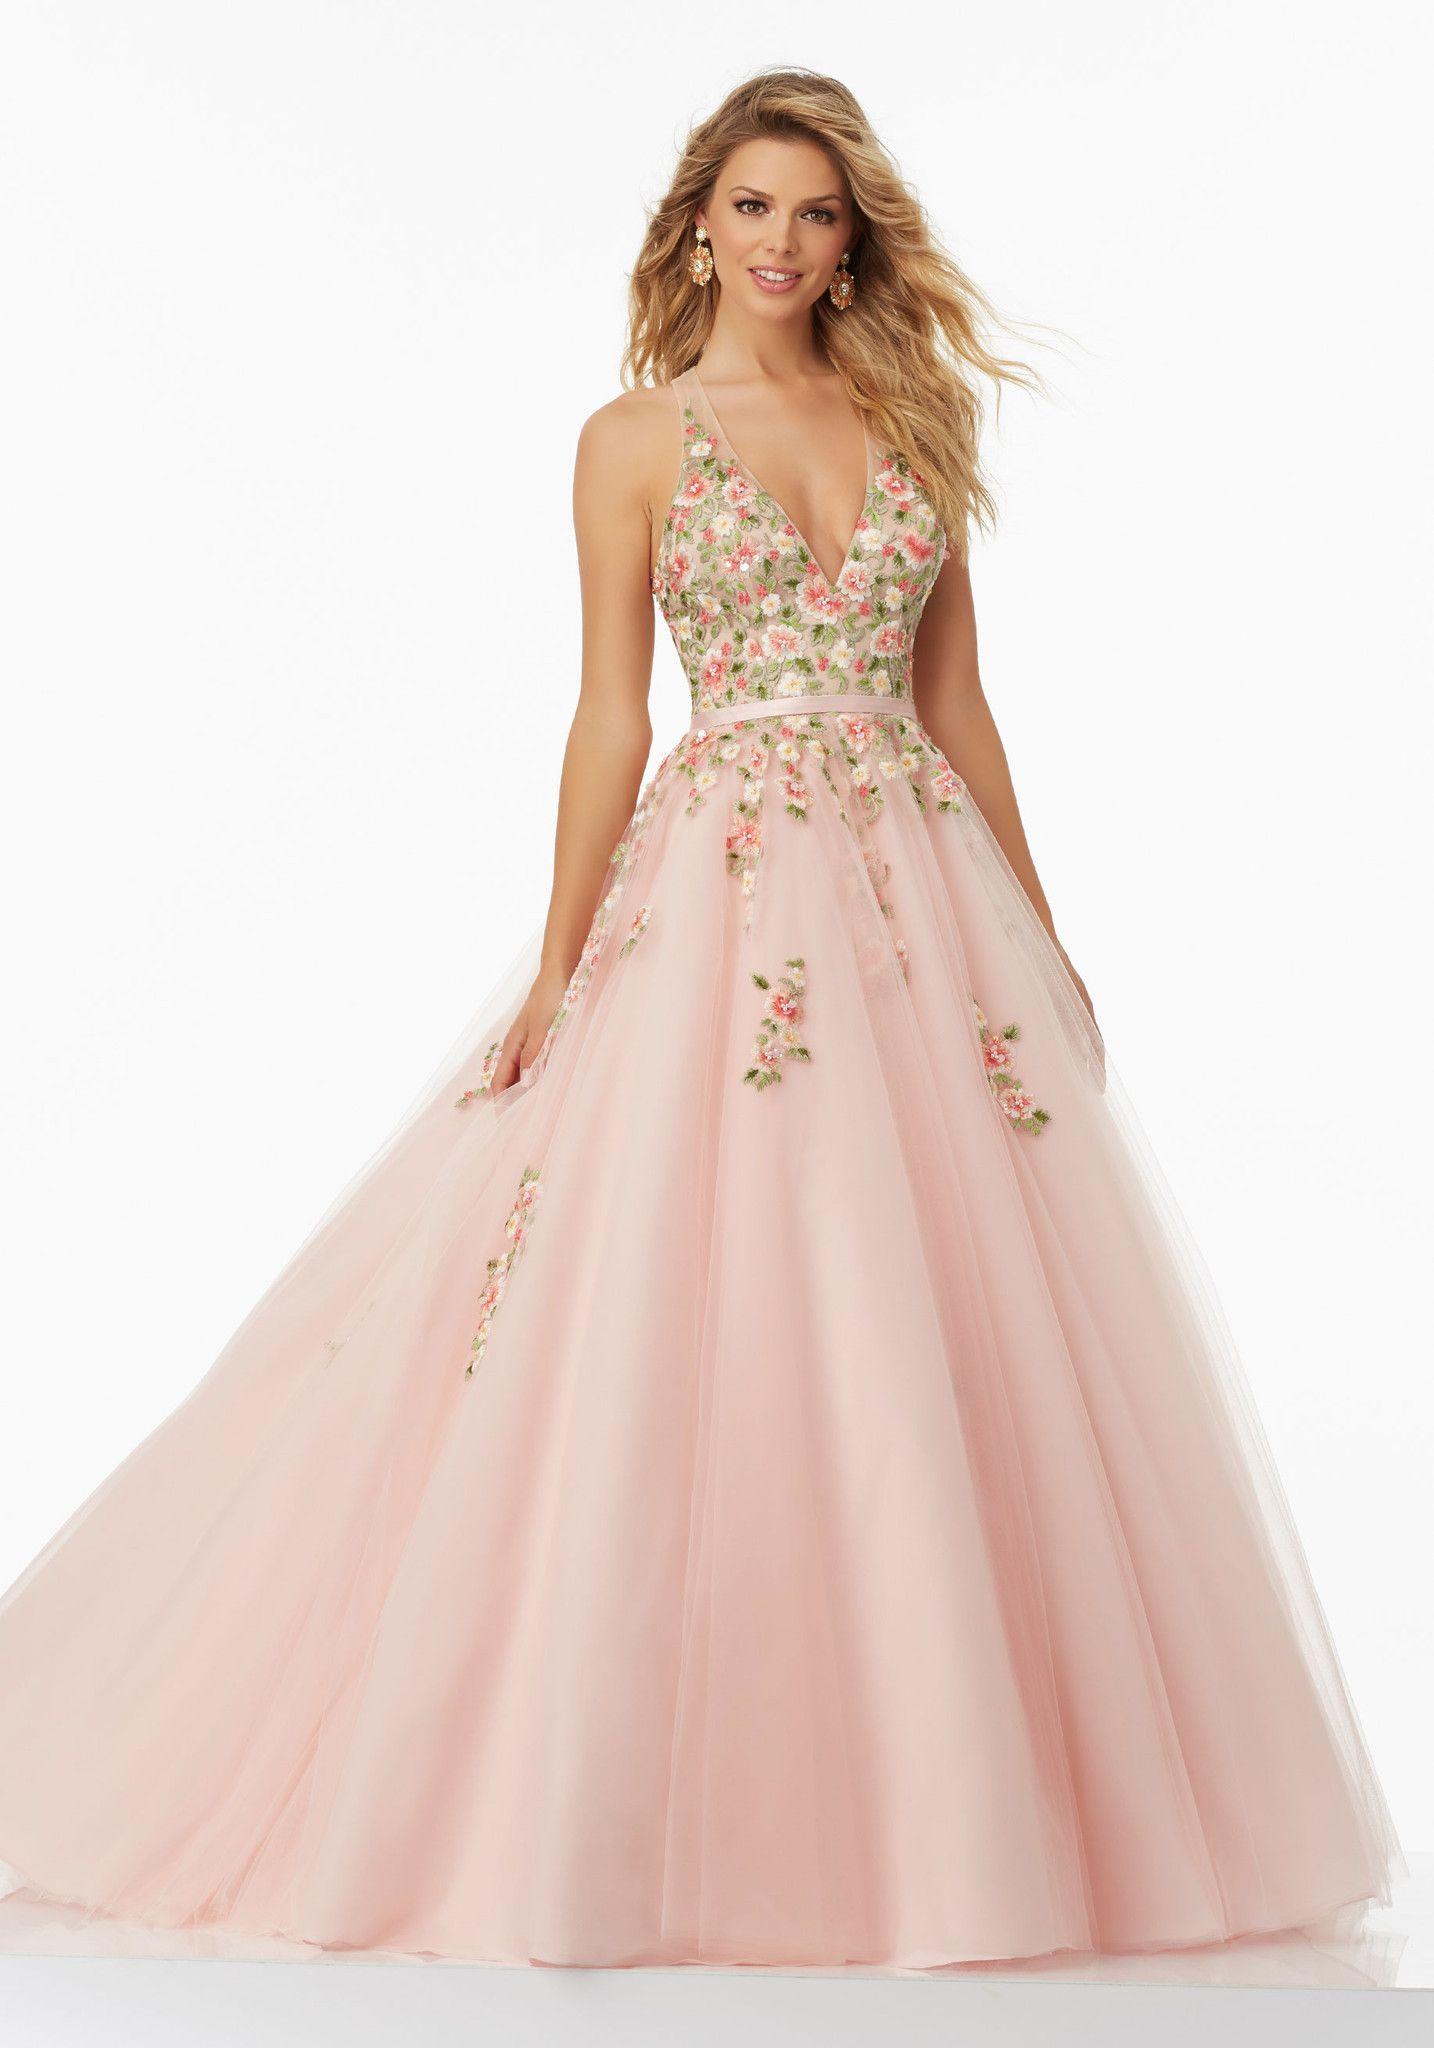 Morilee Prom Dress 99032   PROM   Pinterest